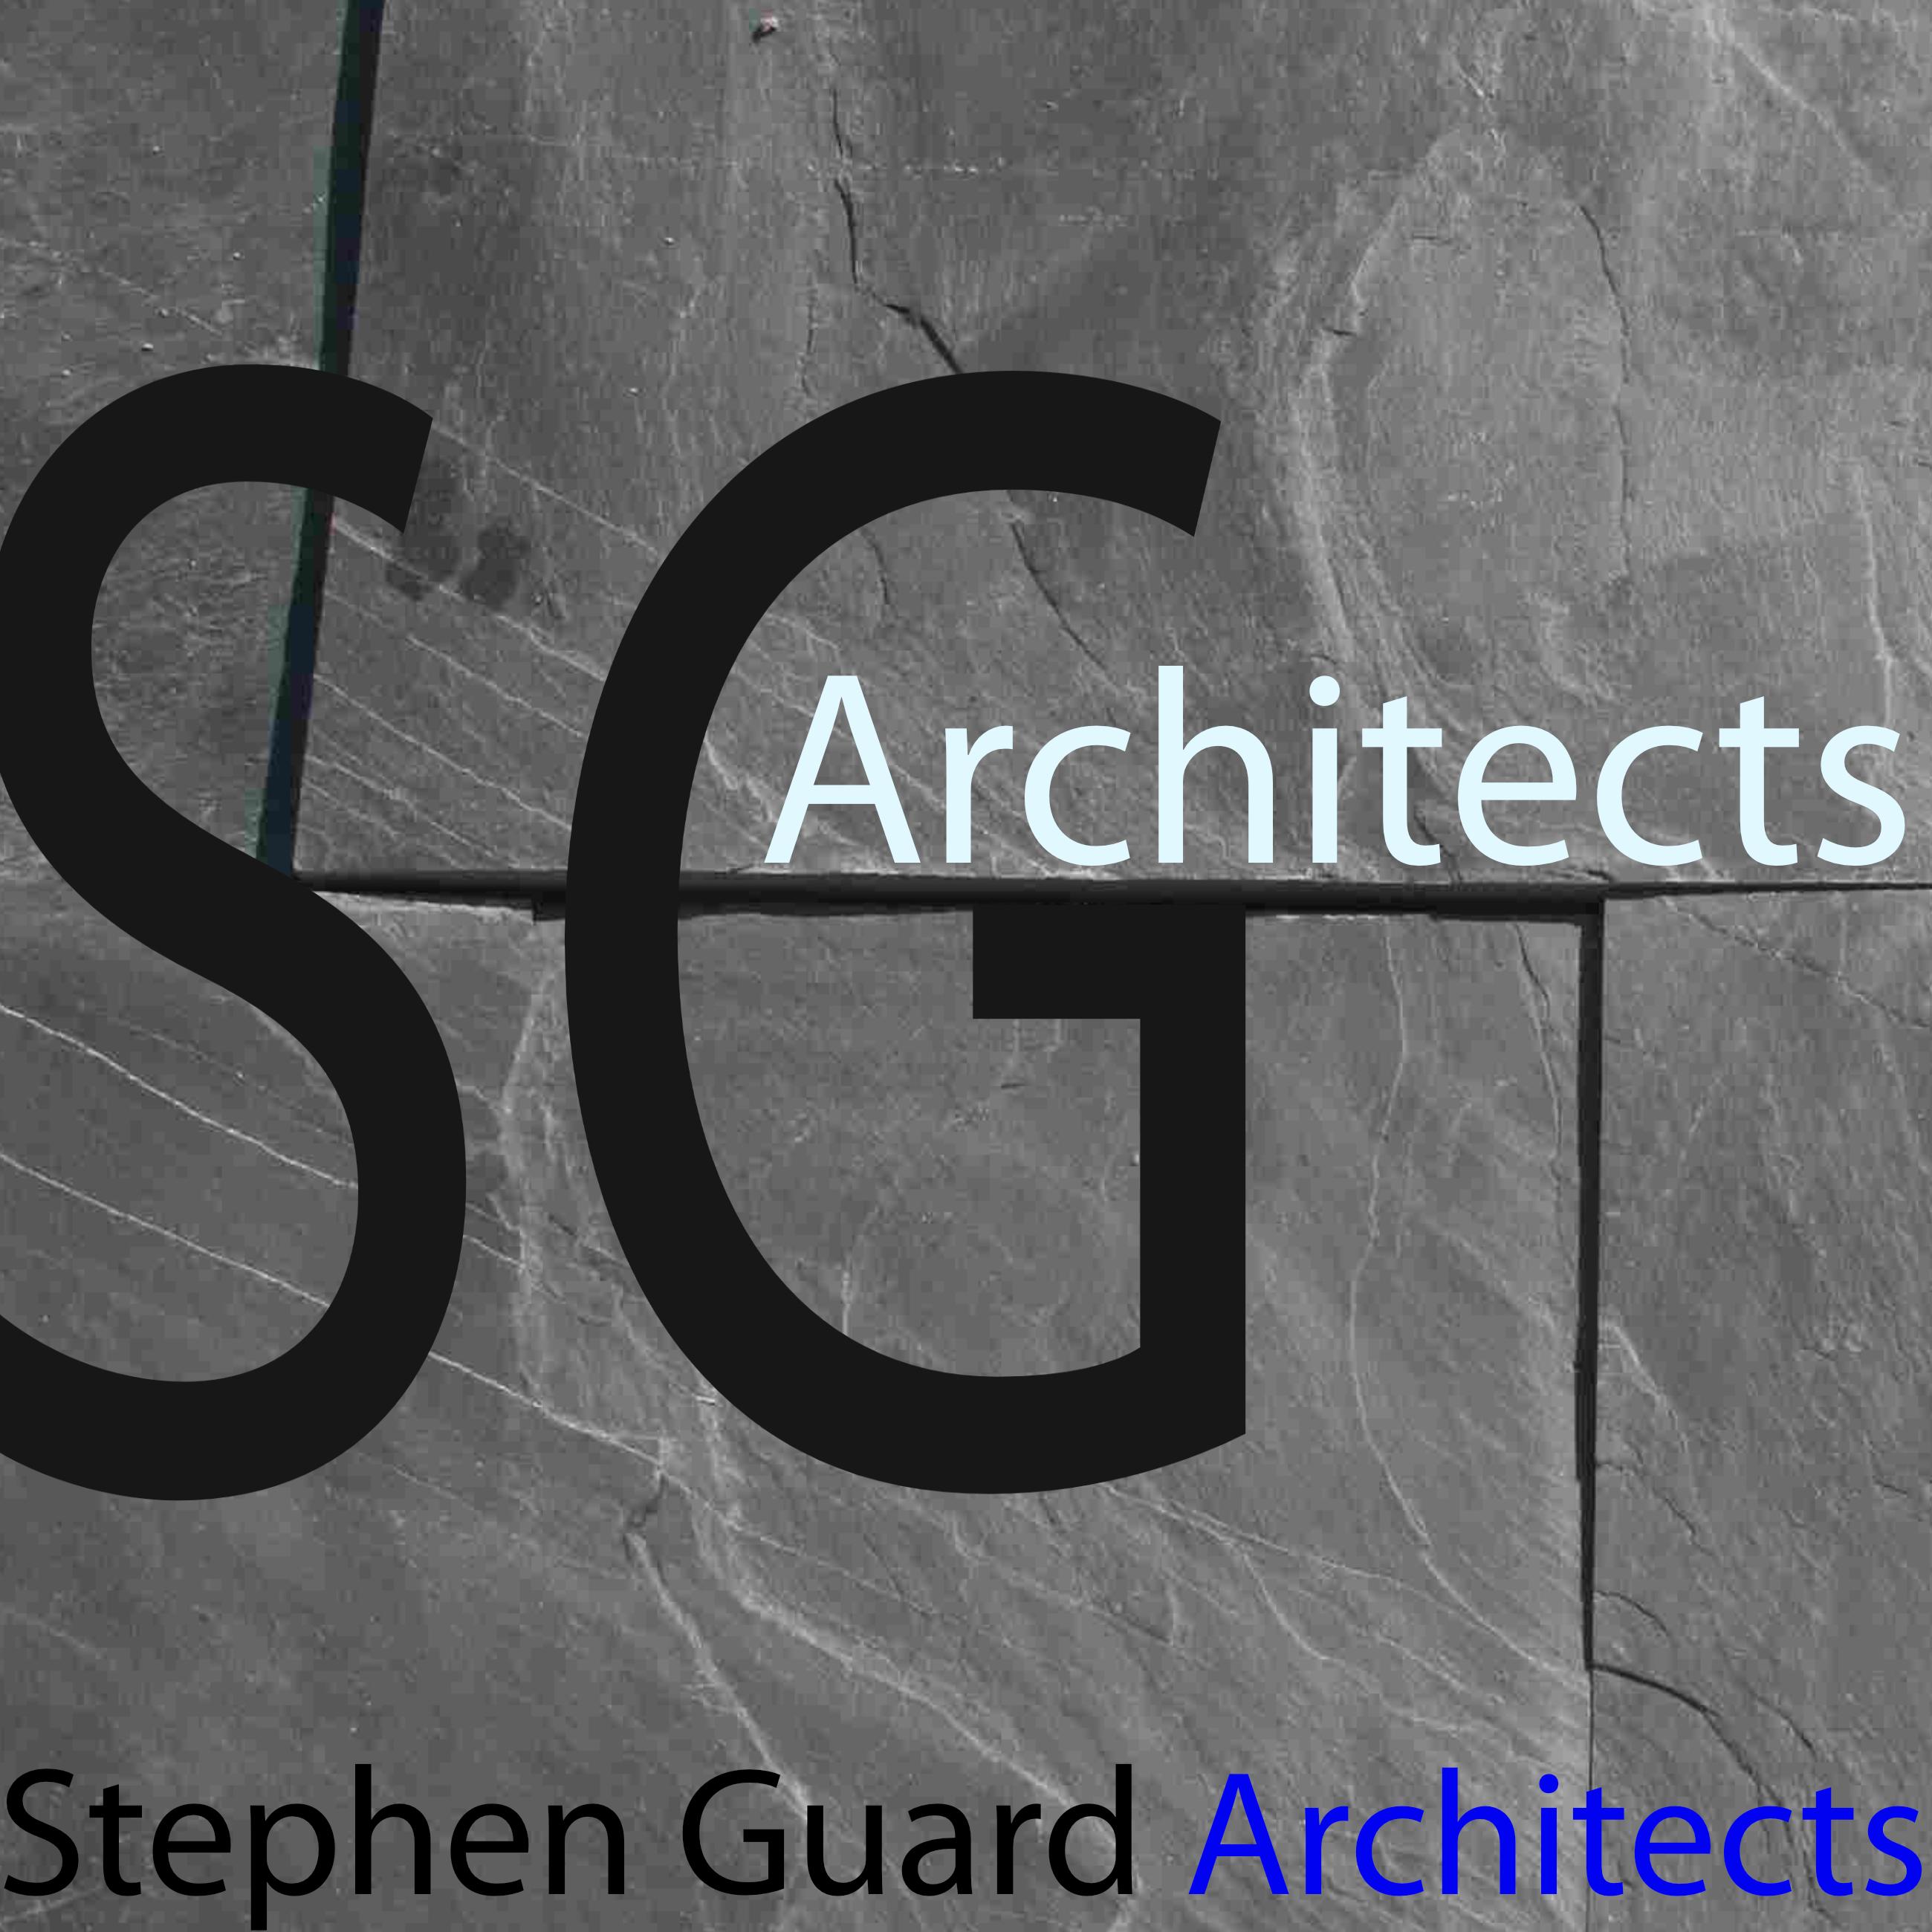 Stephen Guard Architects